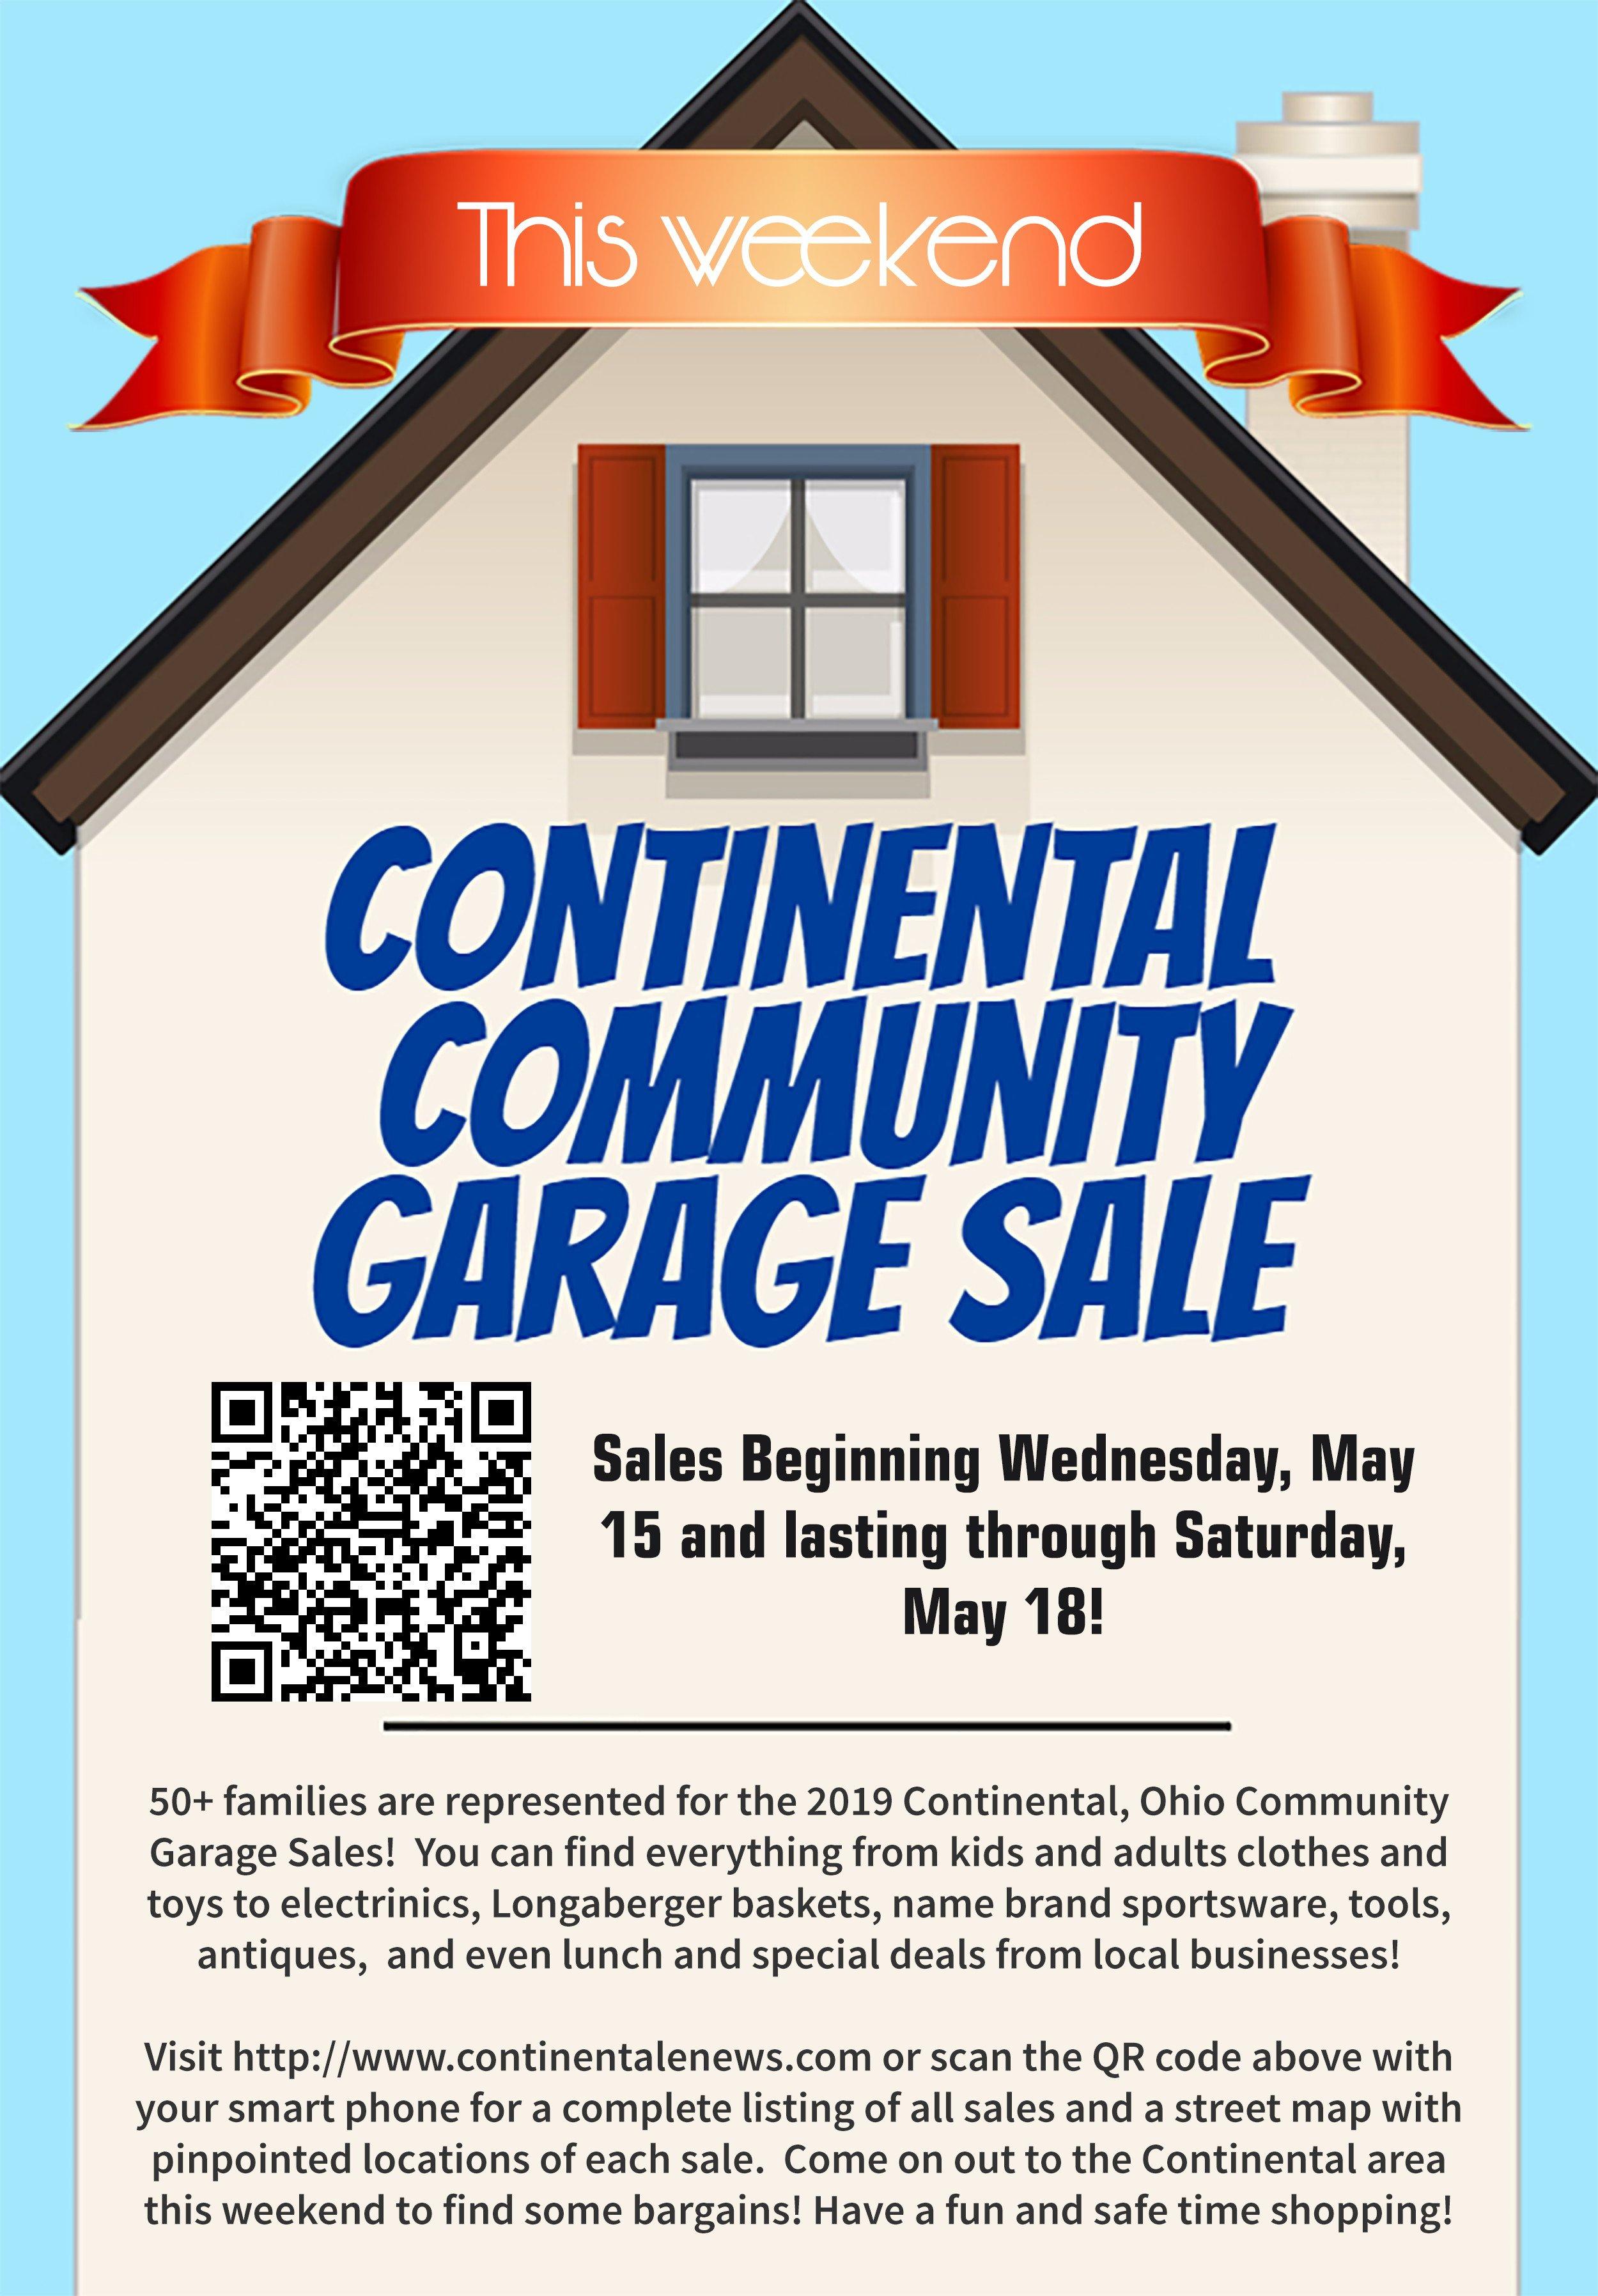 2019 Continental Ohio Community Garage Sale Listings